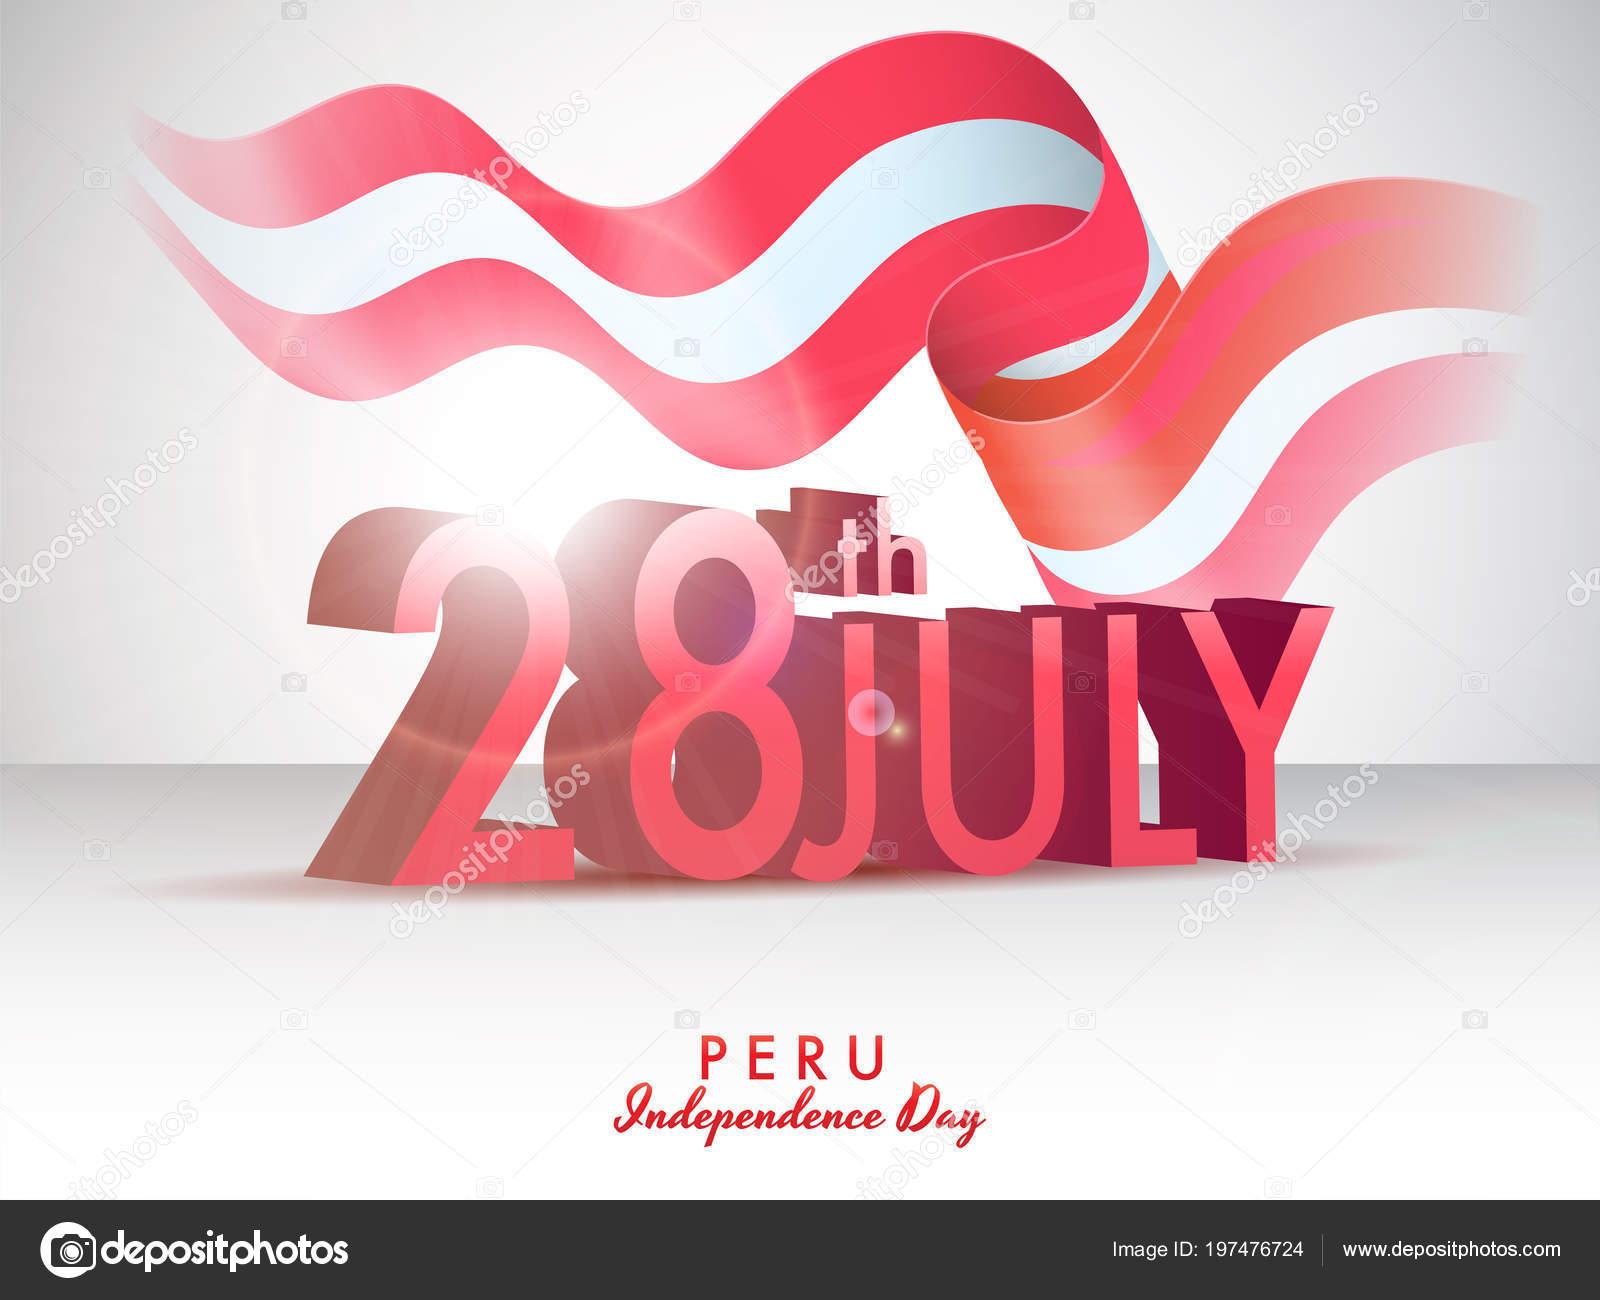 Independence Day Peru Celebration Background Stock Vector C Alliesinteract 197476724